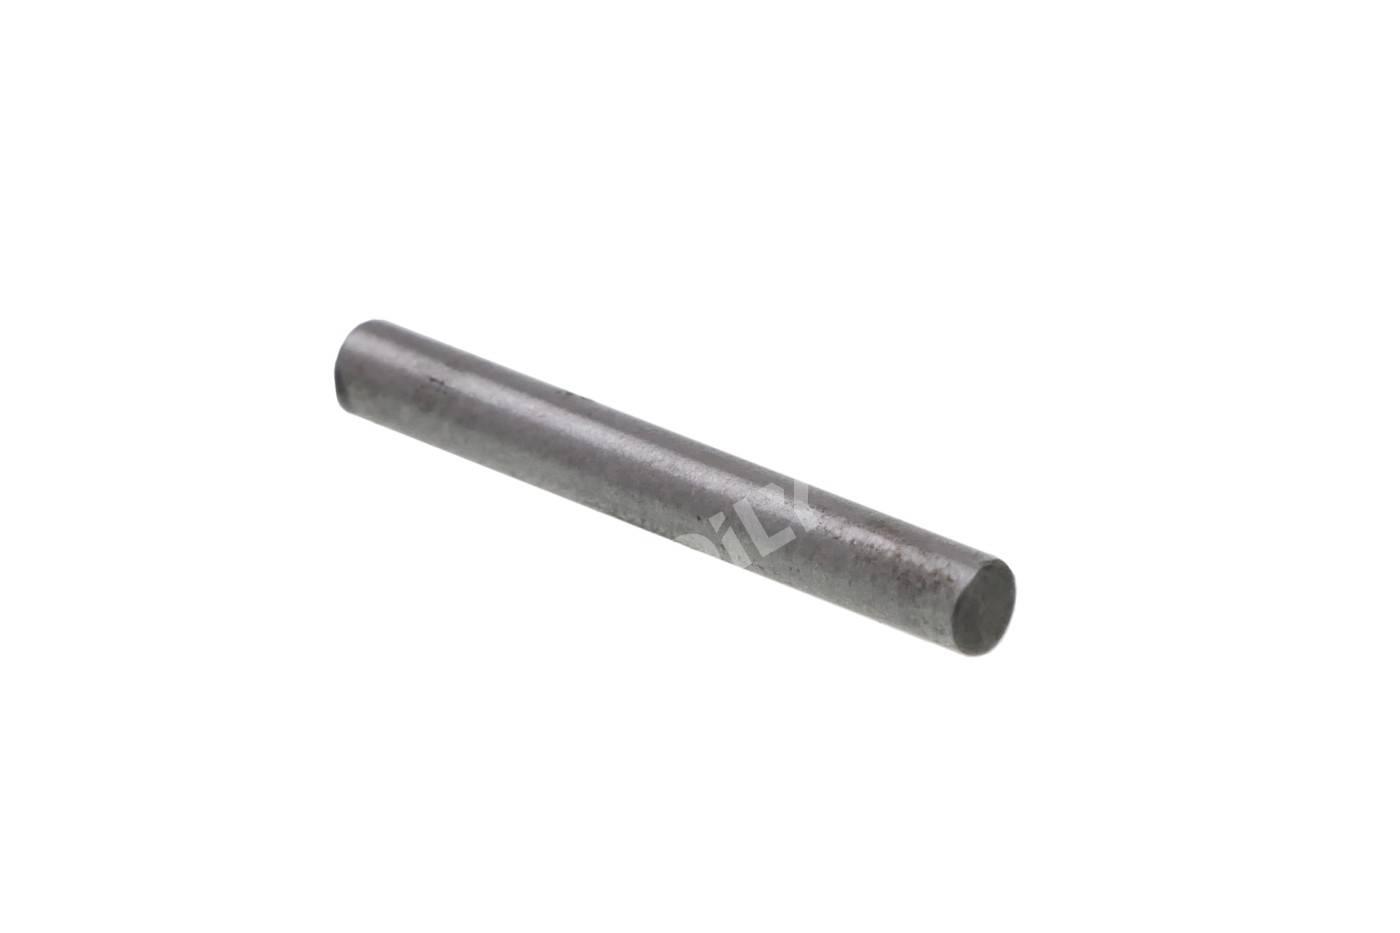 Kolík M3x25 Jonsered CS2165 CS2165 EPA